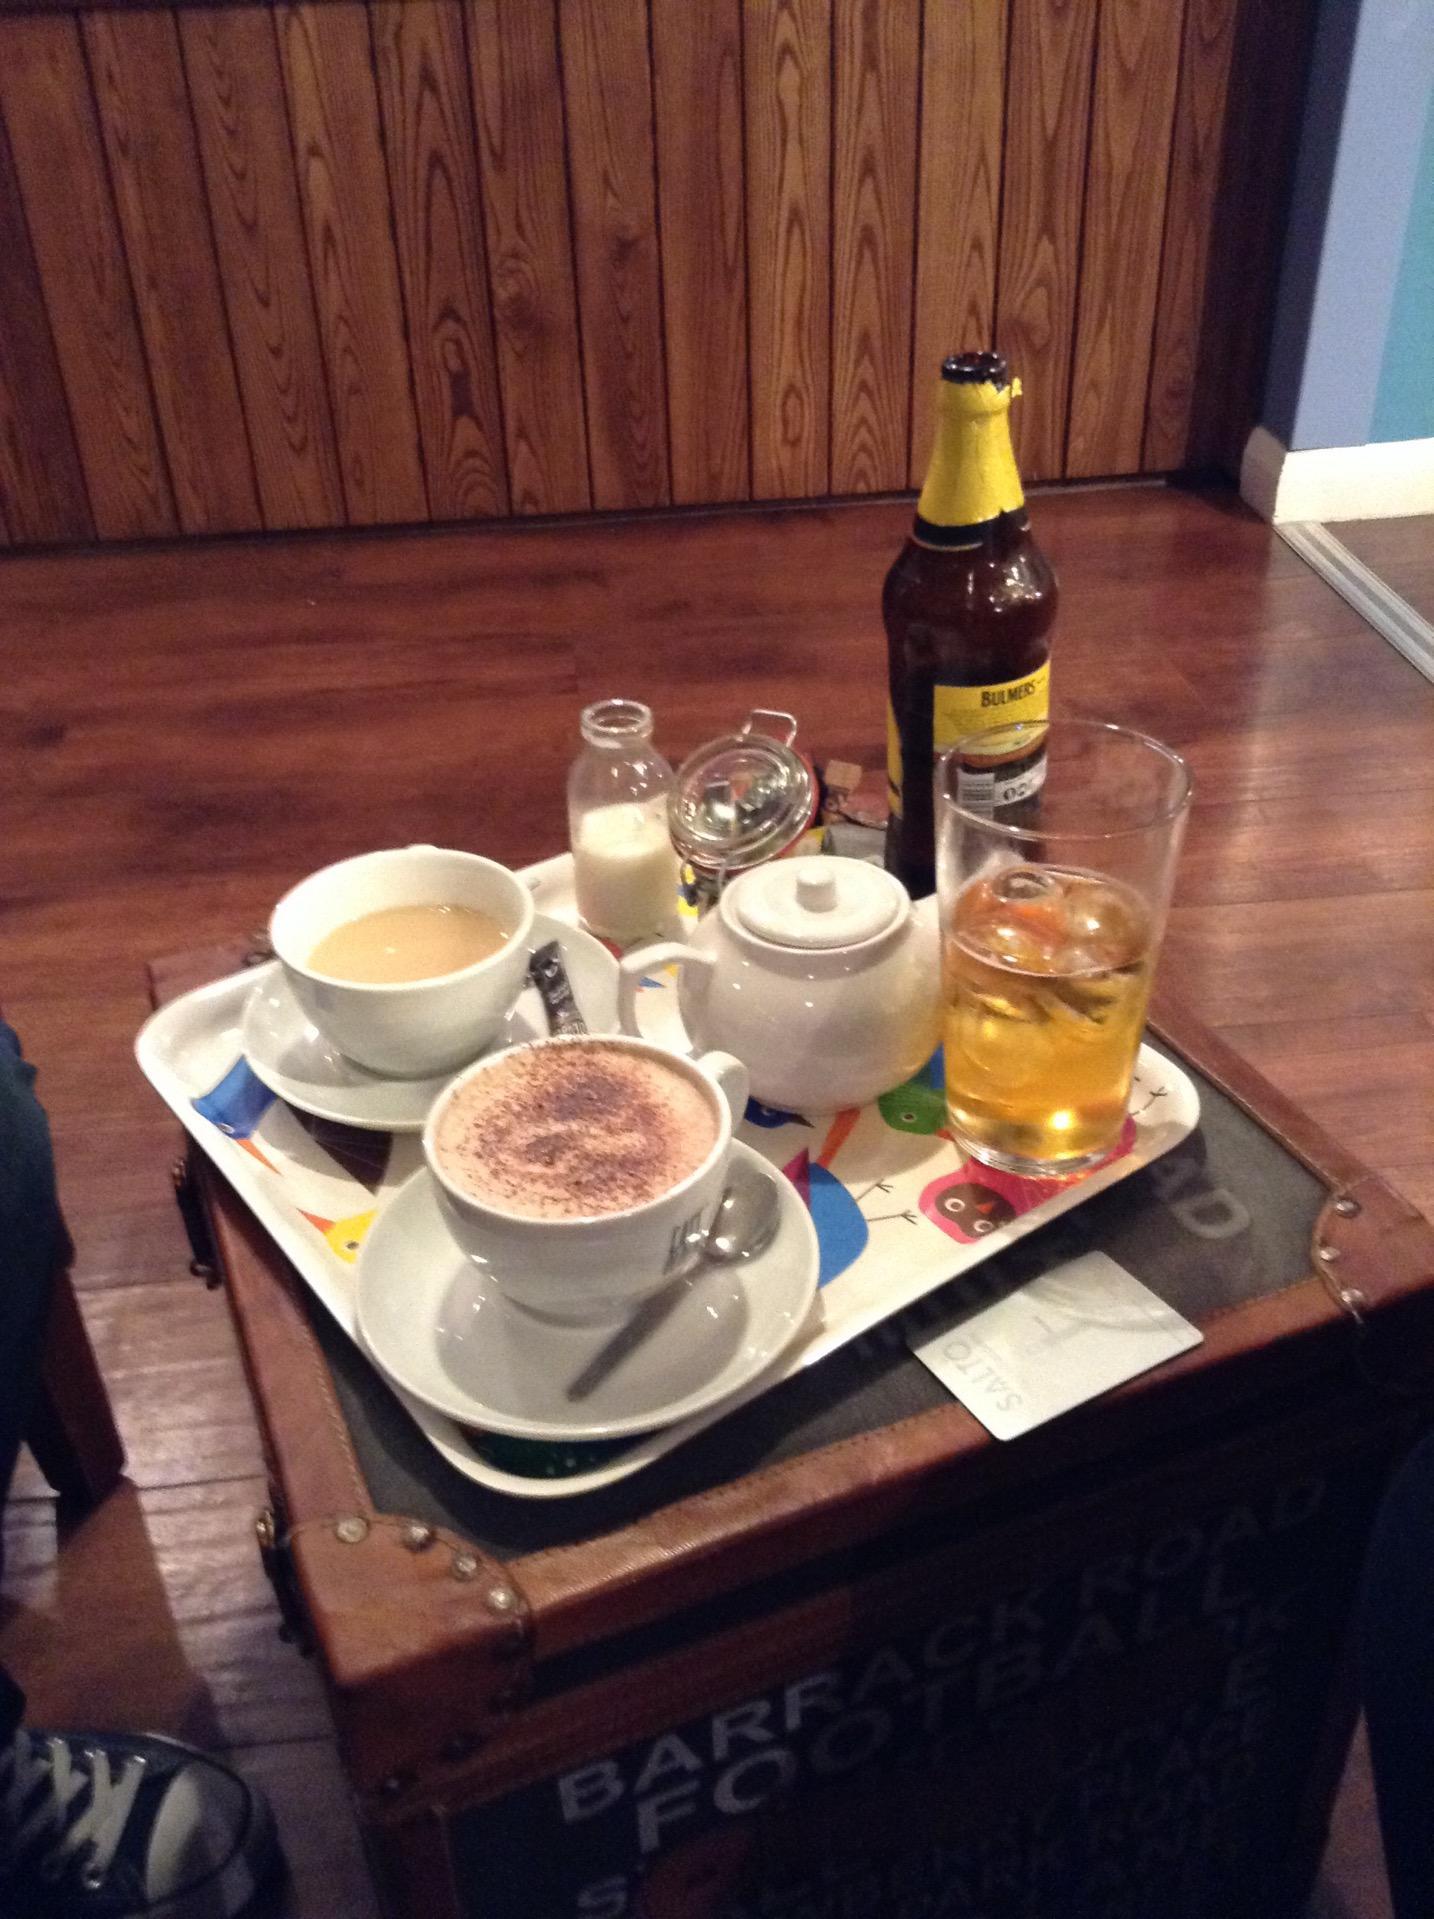 Reasons to visit Cambridge - YHA Hostel